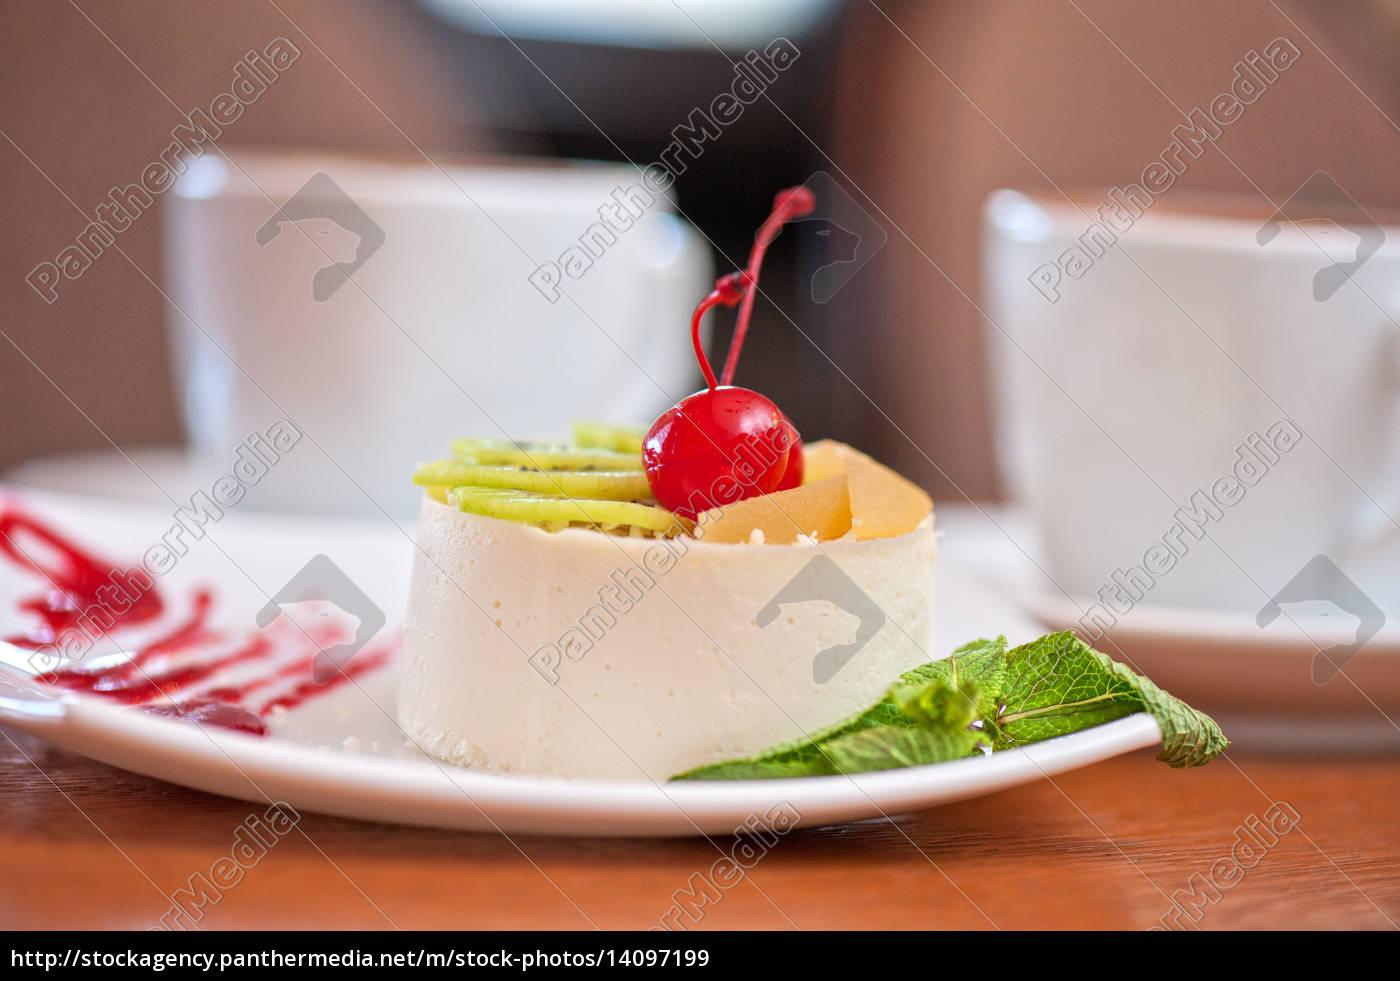 tasty, dessert - 14097199